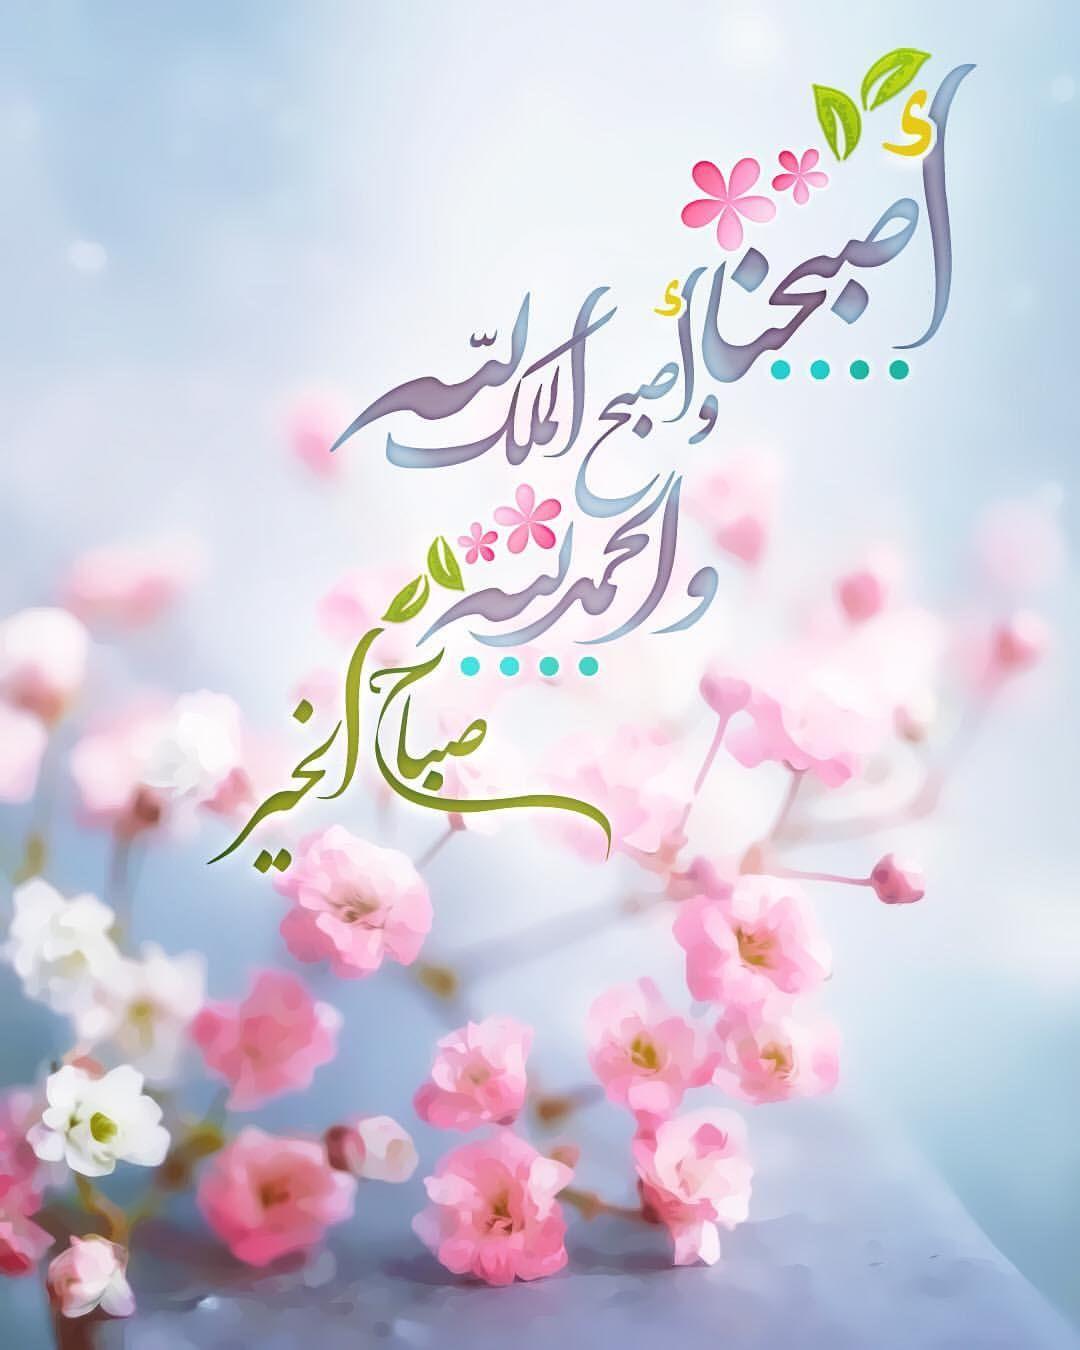 Pearla0203 On Instagram أصب حنا وأصب ح الم لك لله والح مدلله ㅤㅤㅤㅤㅤ ㅤㅤㅤㅤㅤ صباح الخ Morning Greeting Beautiful Morning Messages Islamic Images